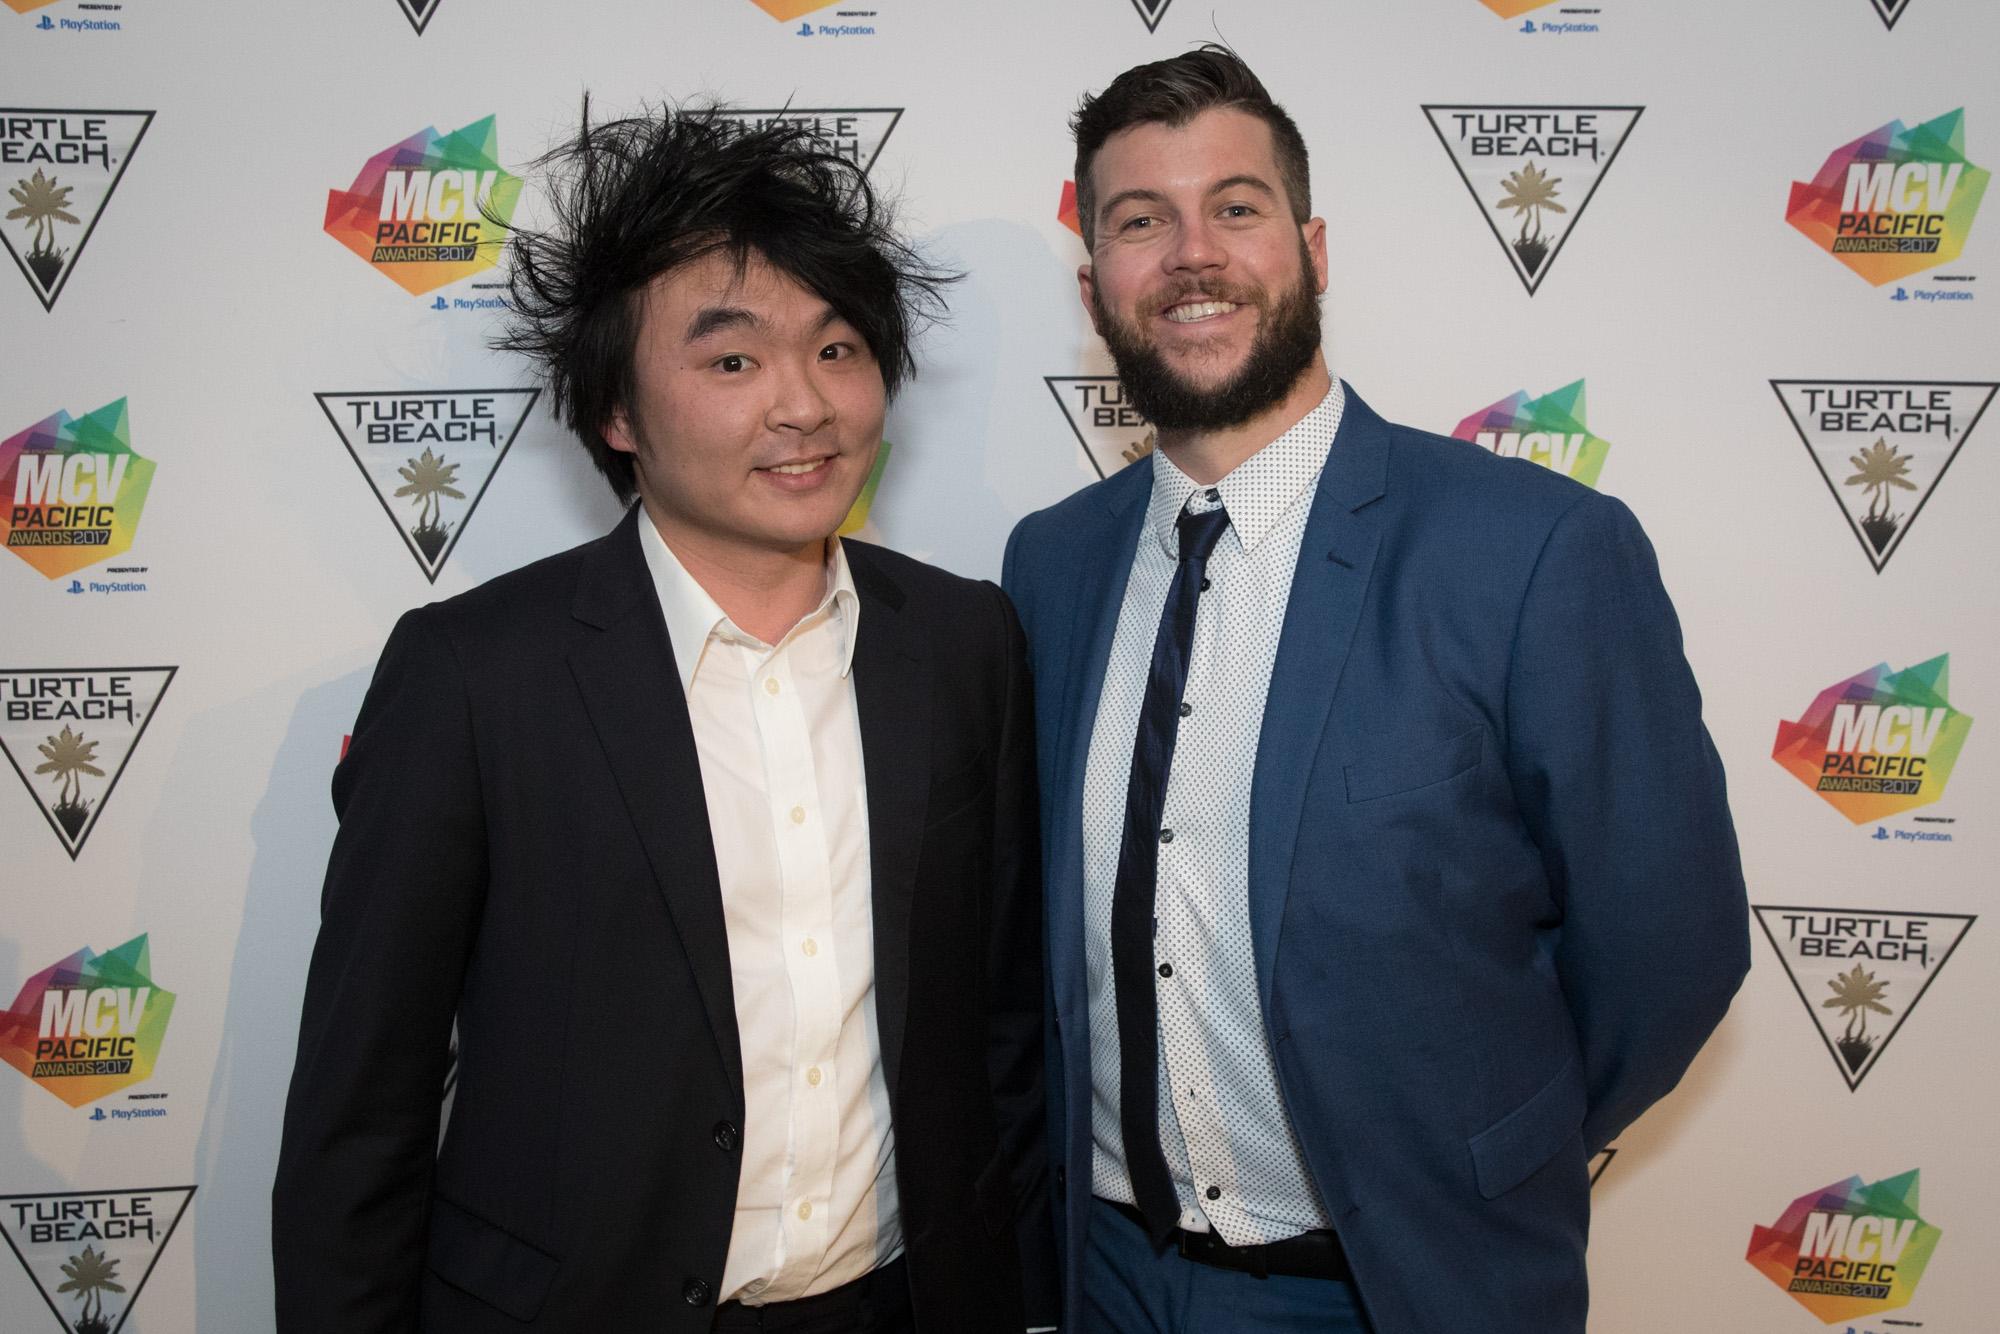 MCV_Pacific_Awards_1_June_17_PS_080.jpg